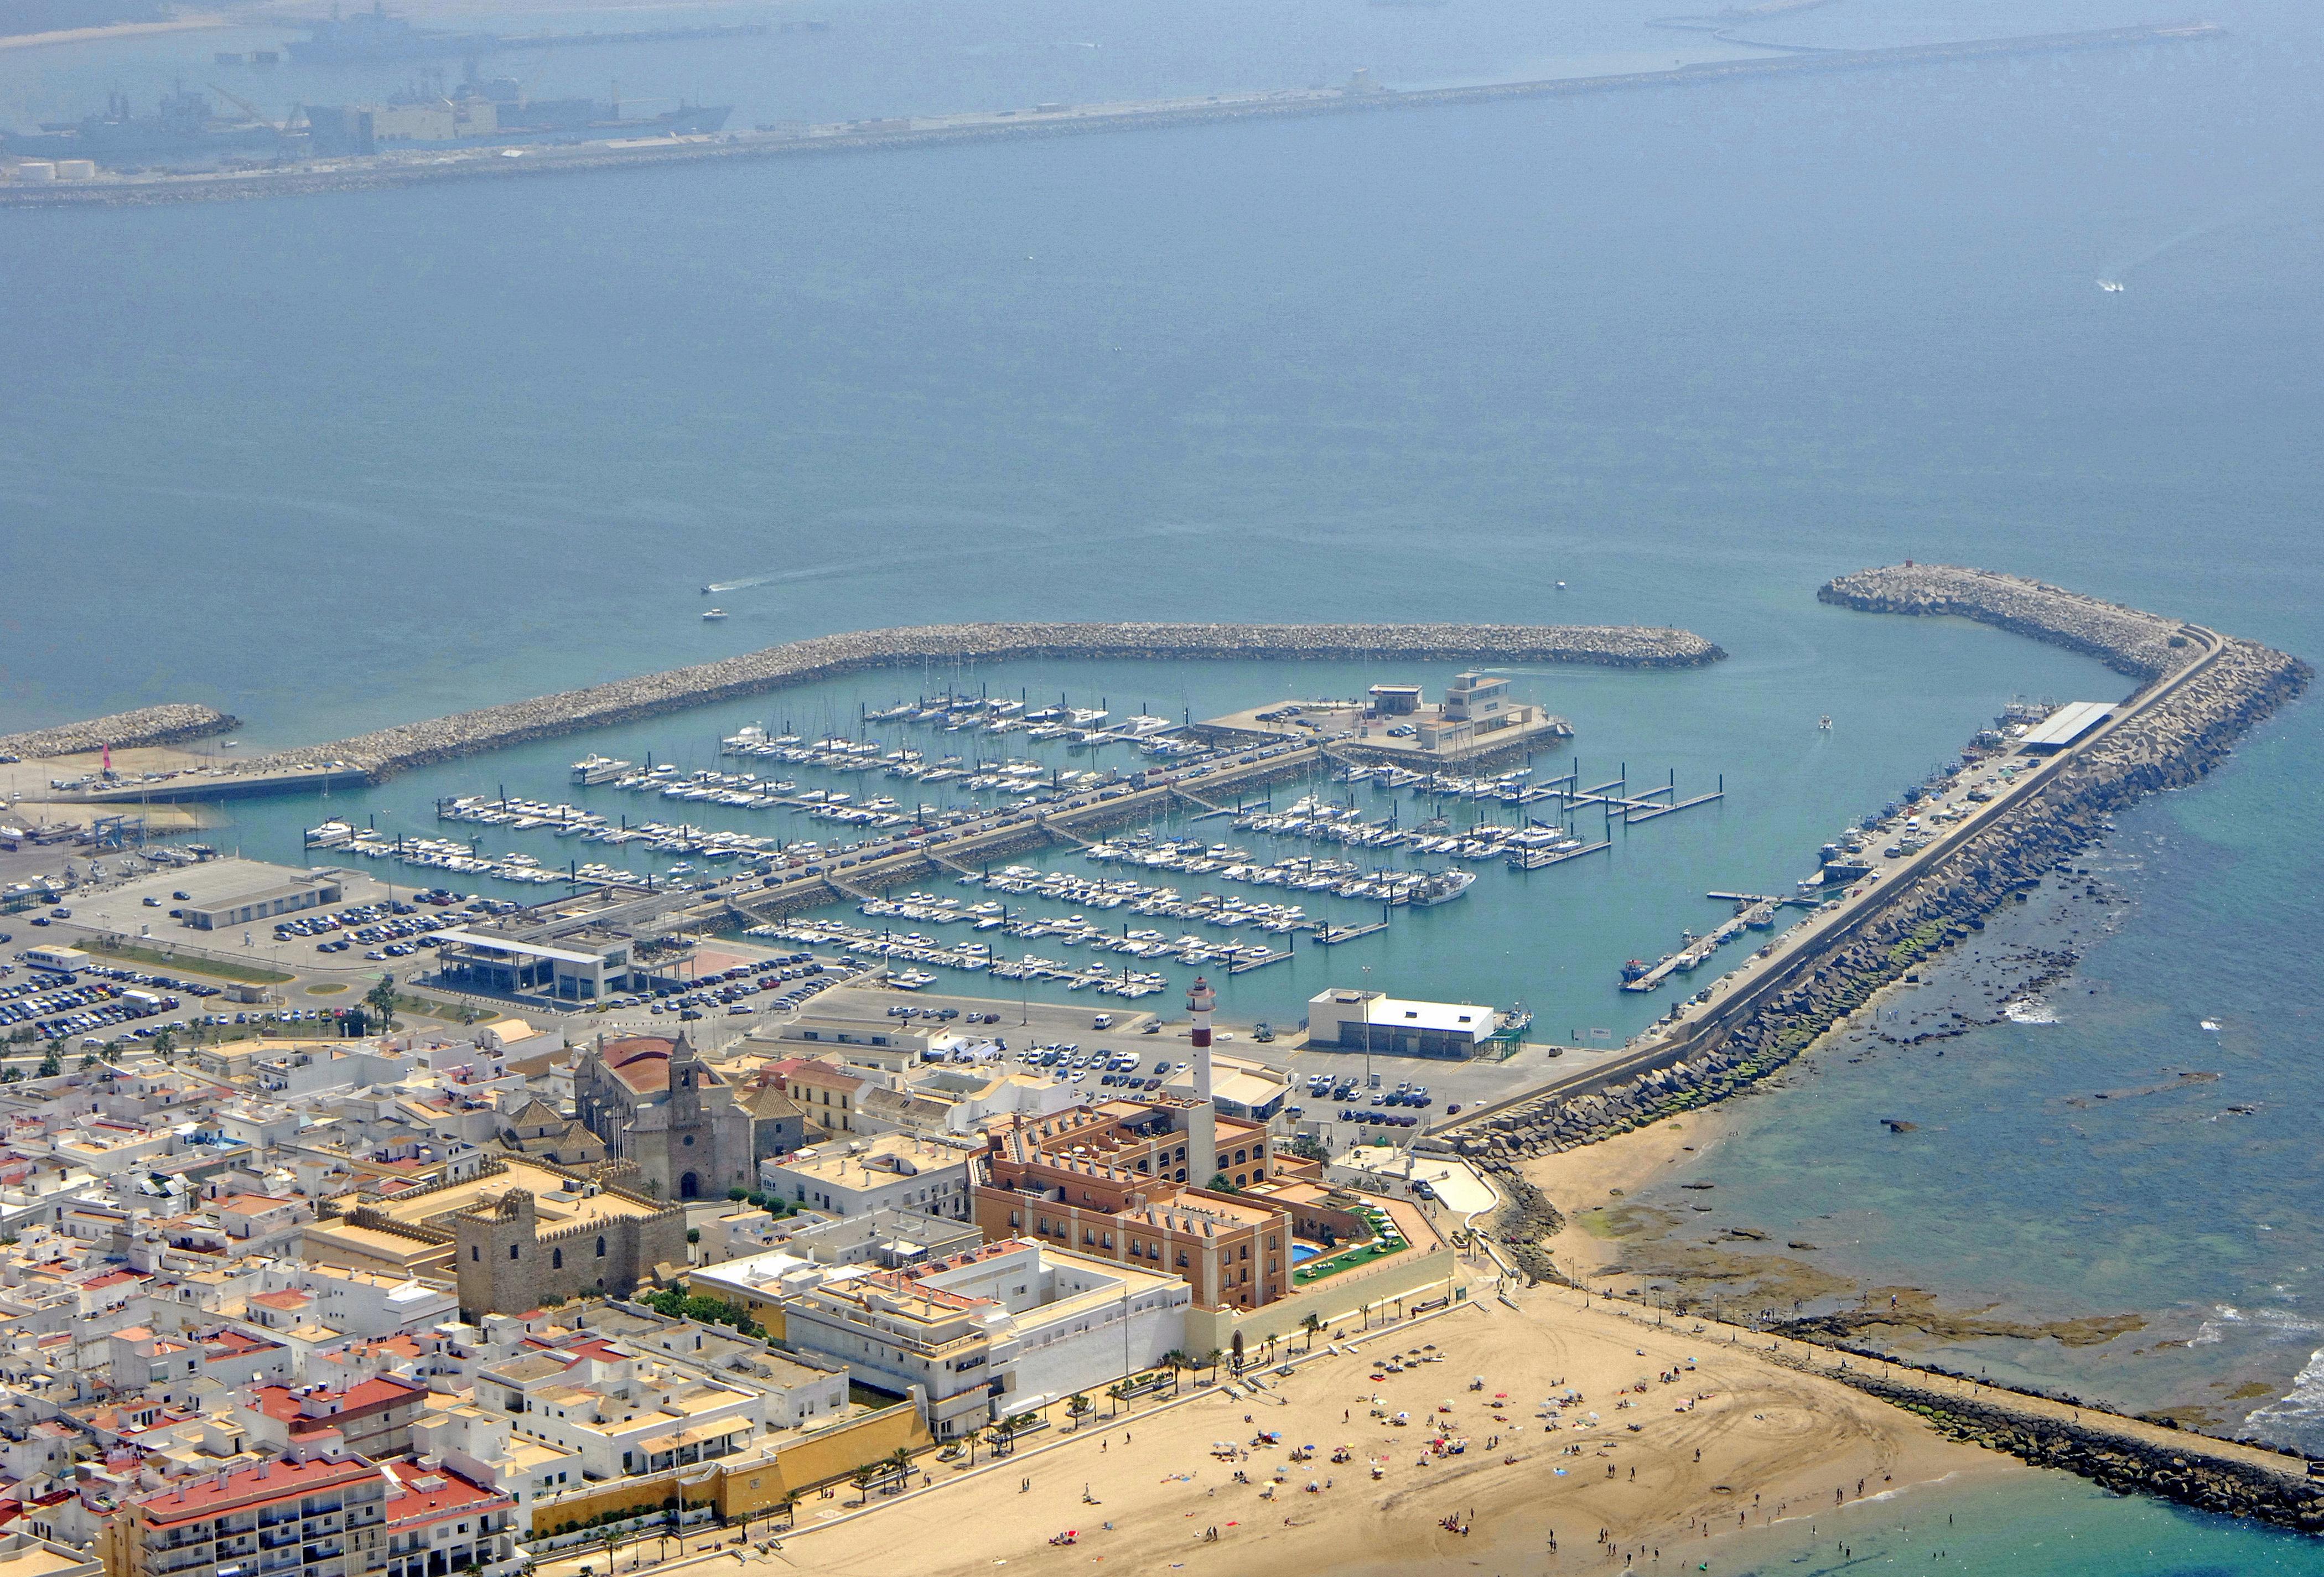 Puerto de rota marina in rota cadiz andalucia spain marina reviews phone number - Puerto rico spain weather ...